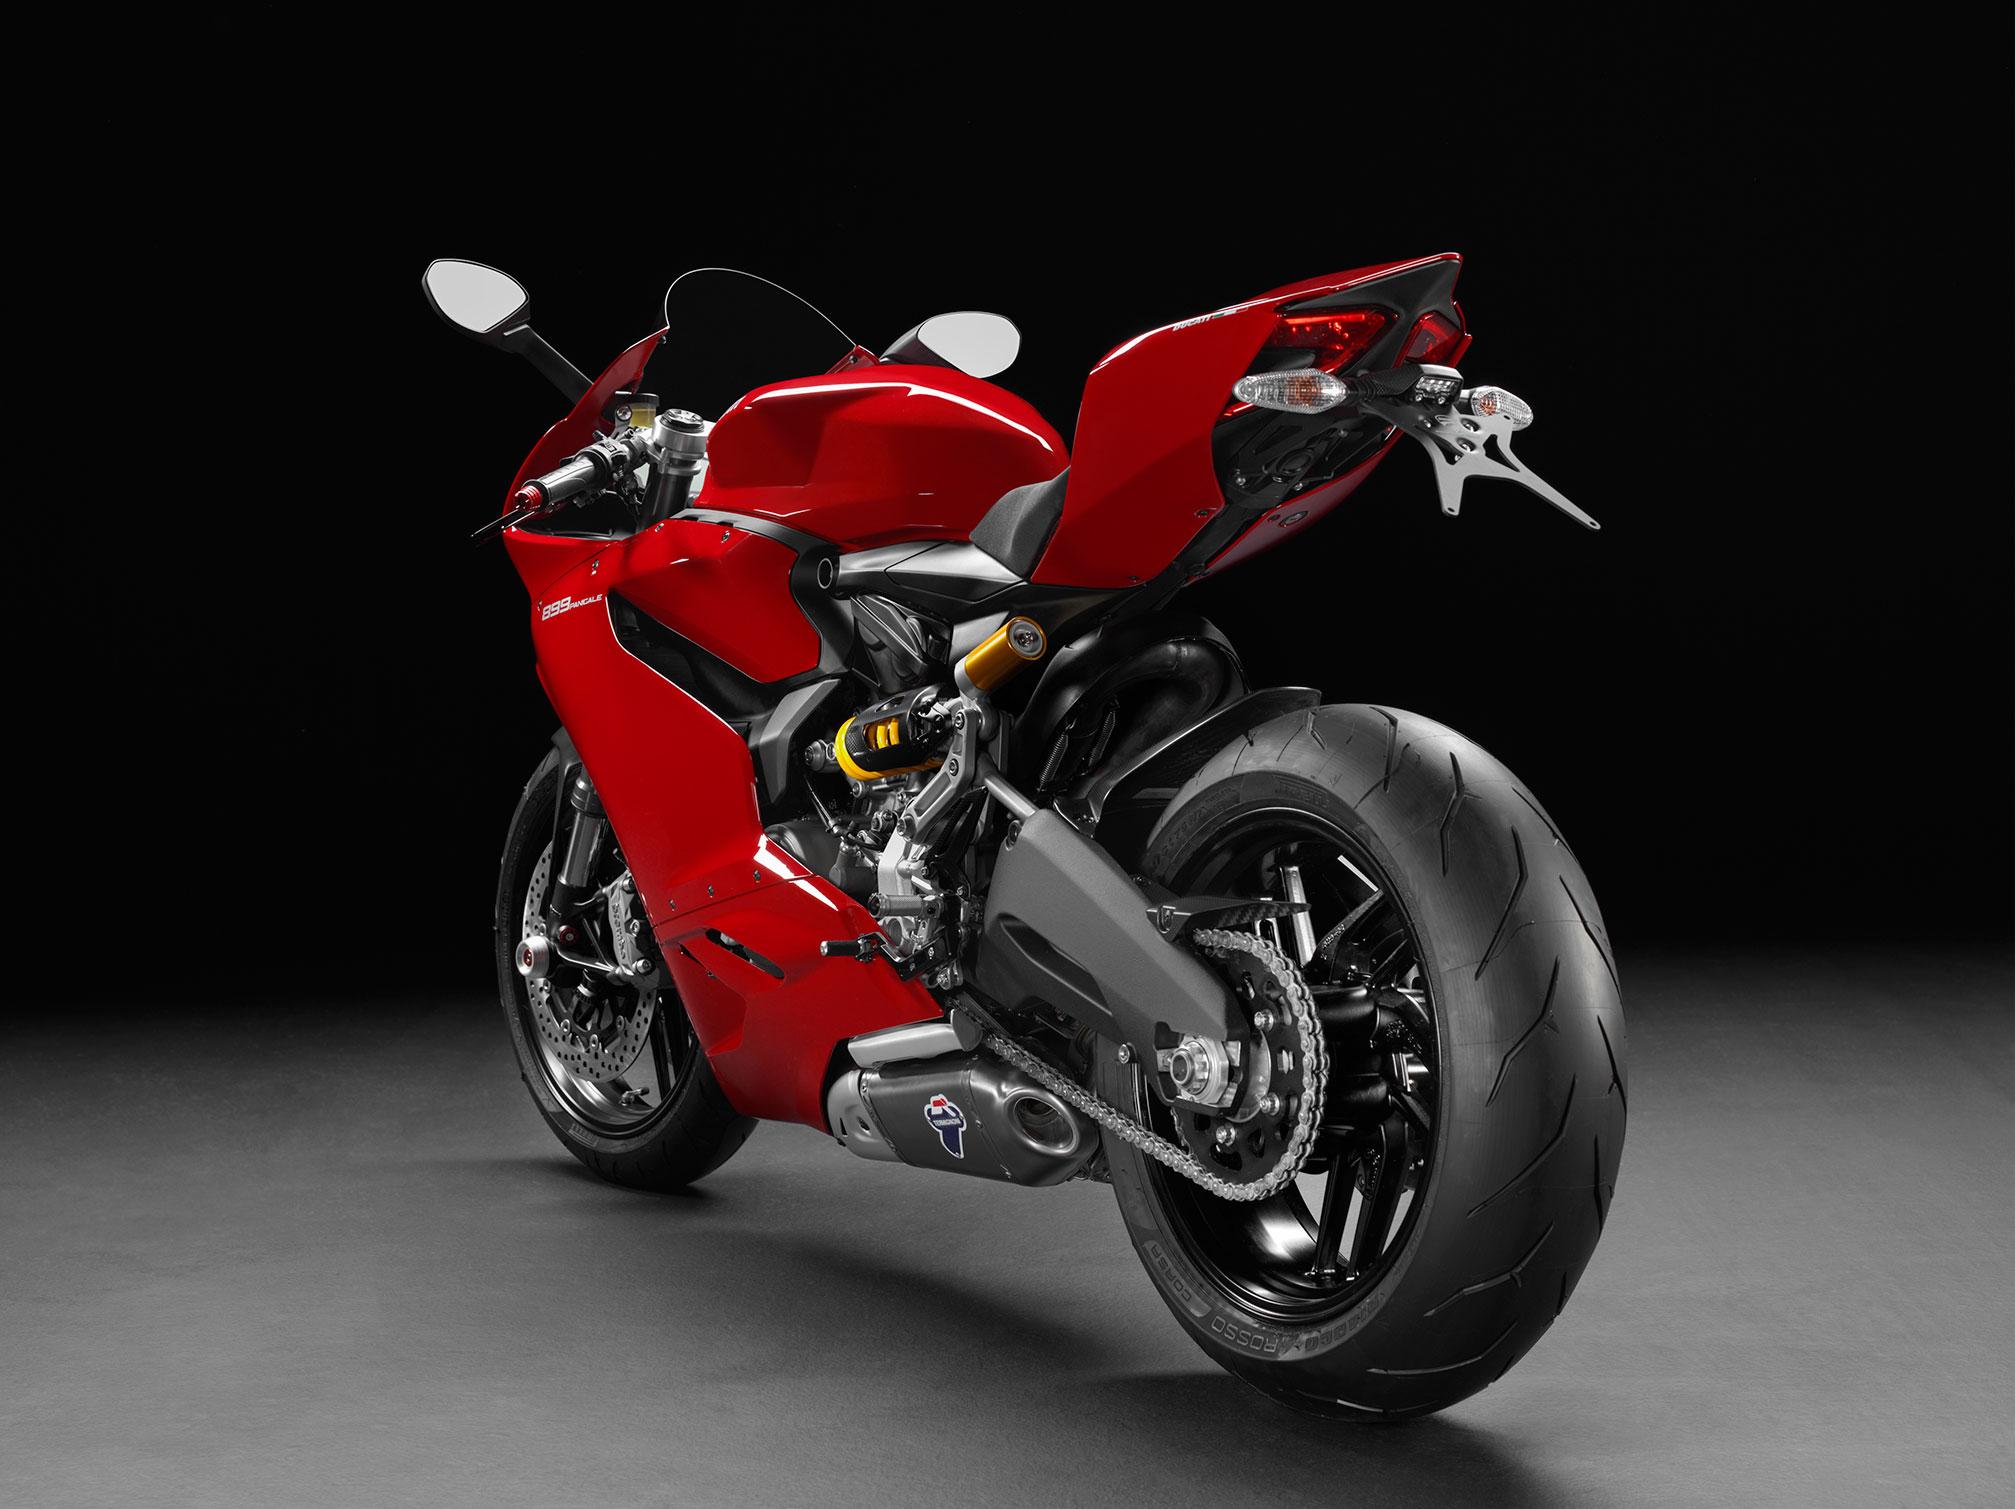 2015 Ducati 899 Panigale 2